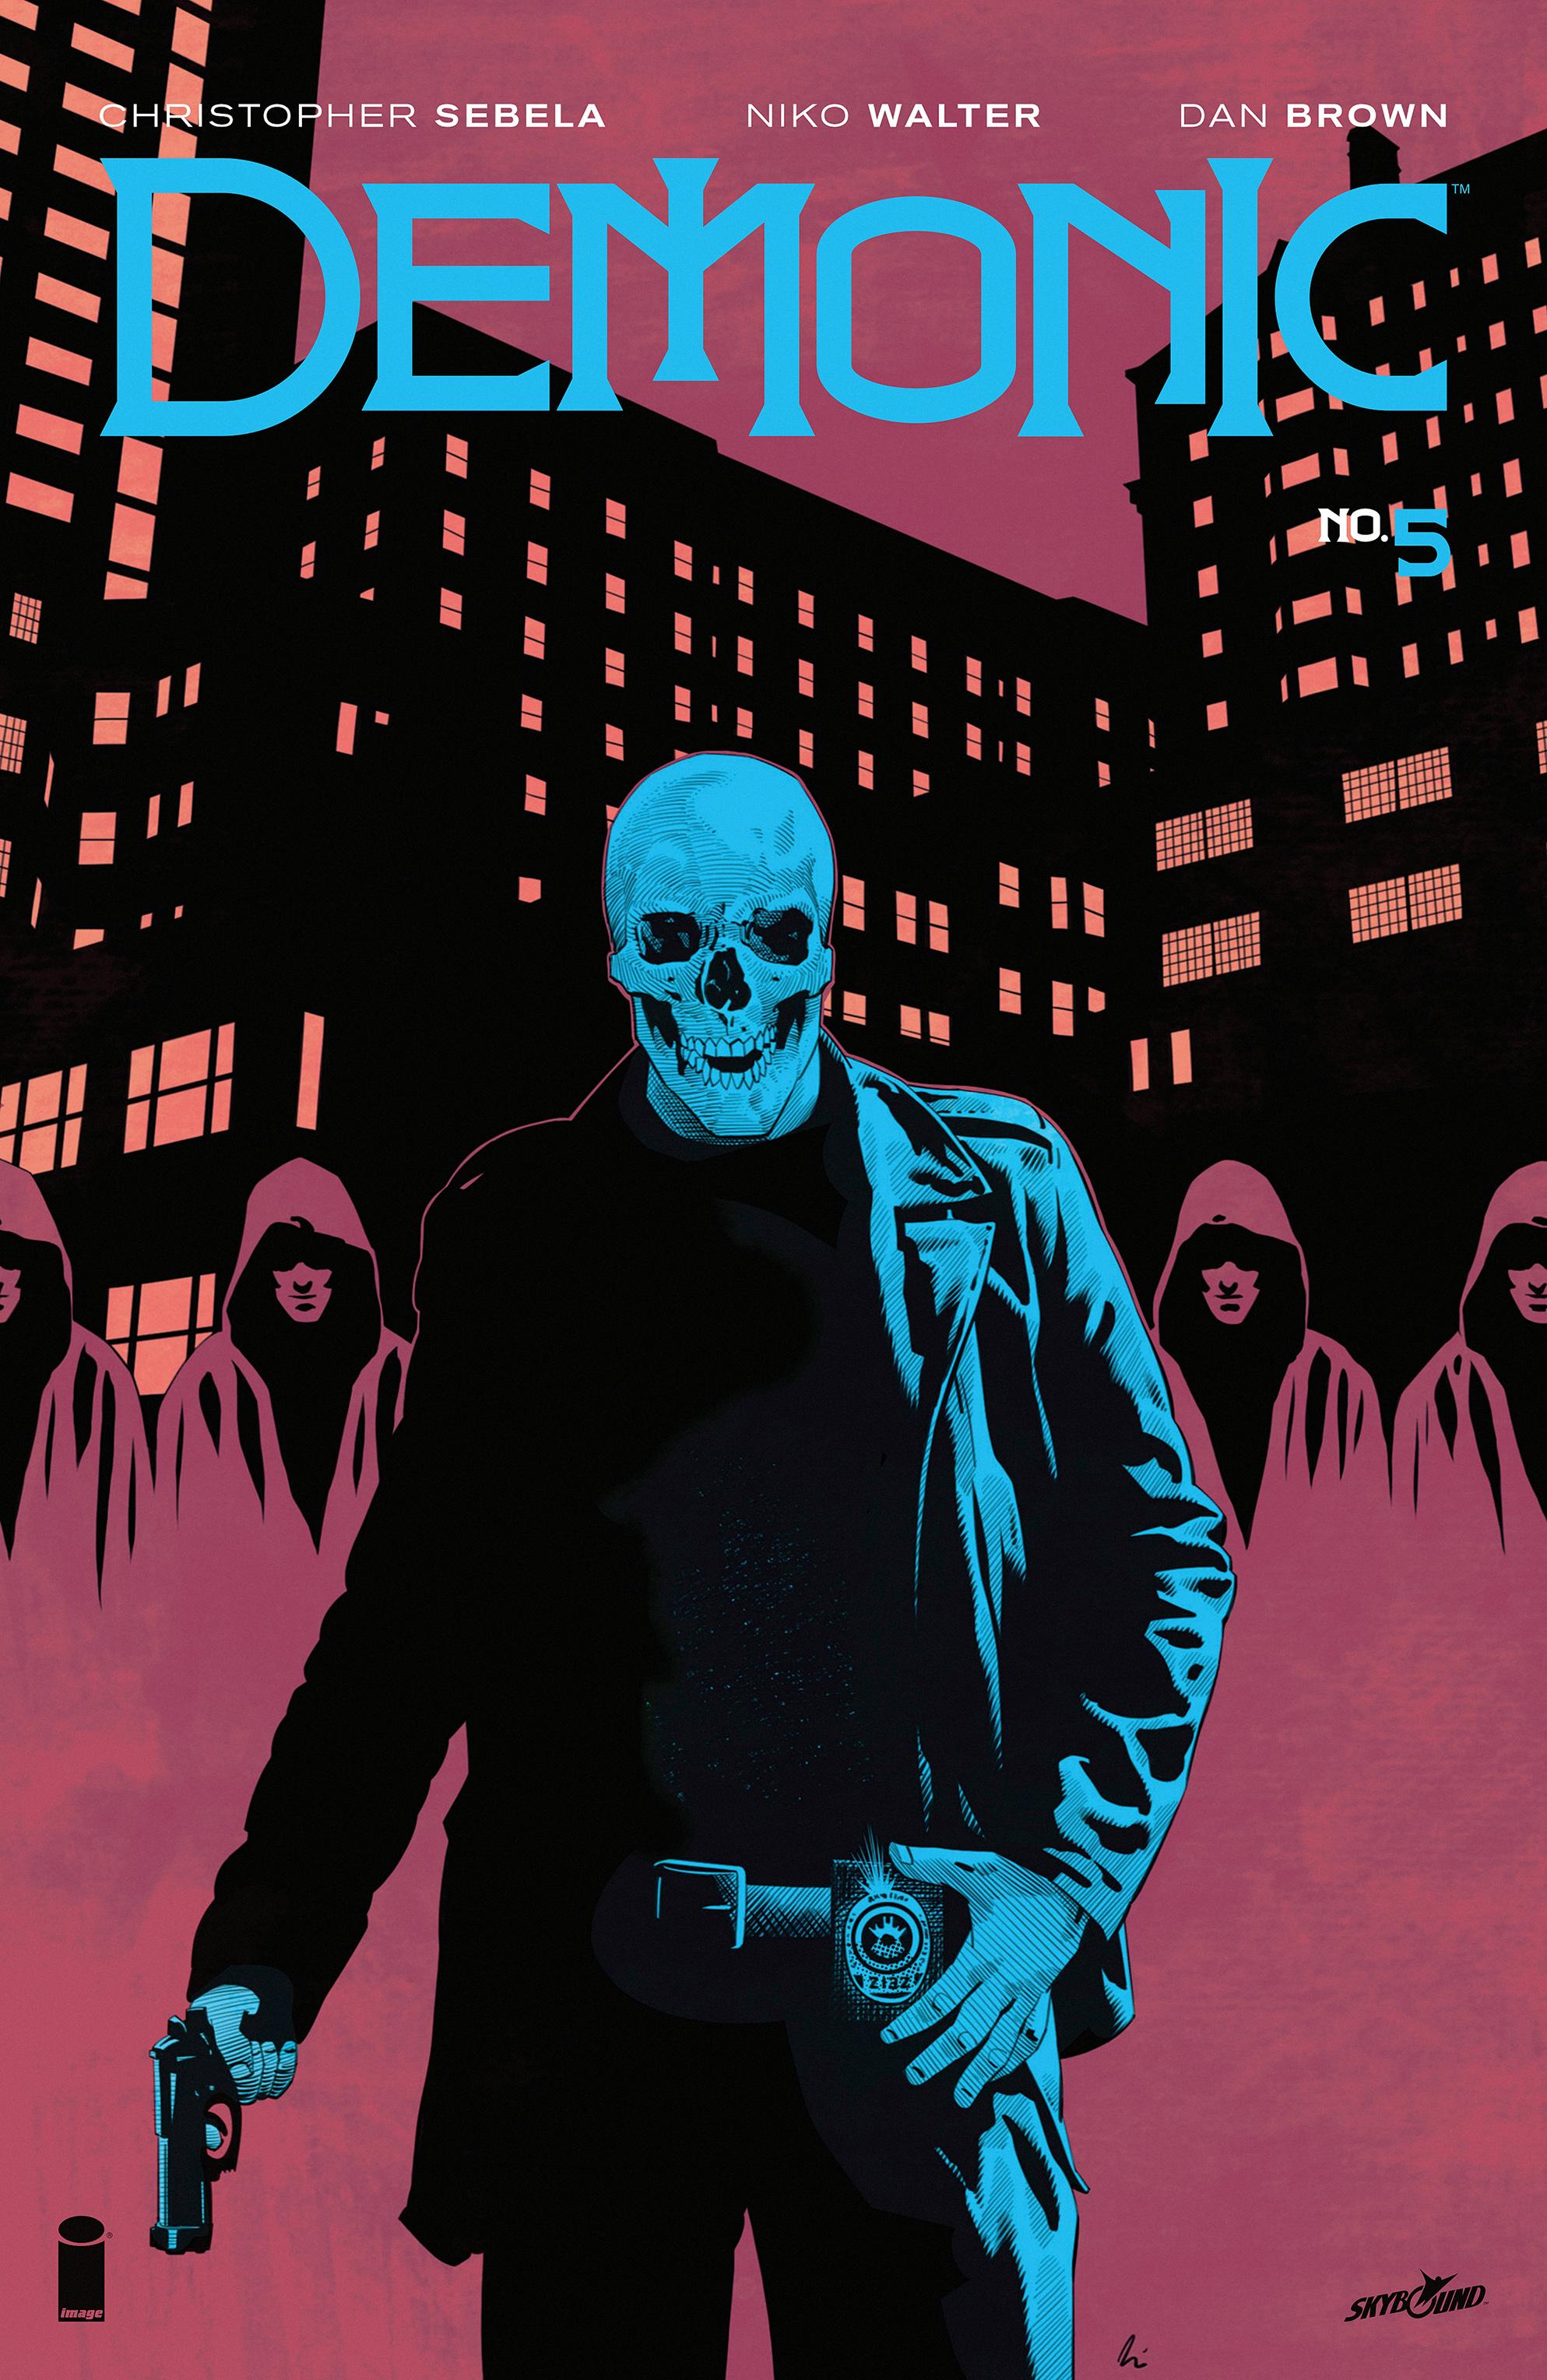 Read online Demonic comic -  Issue #5 - 1